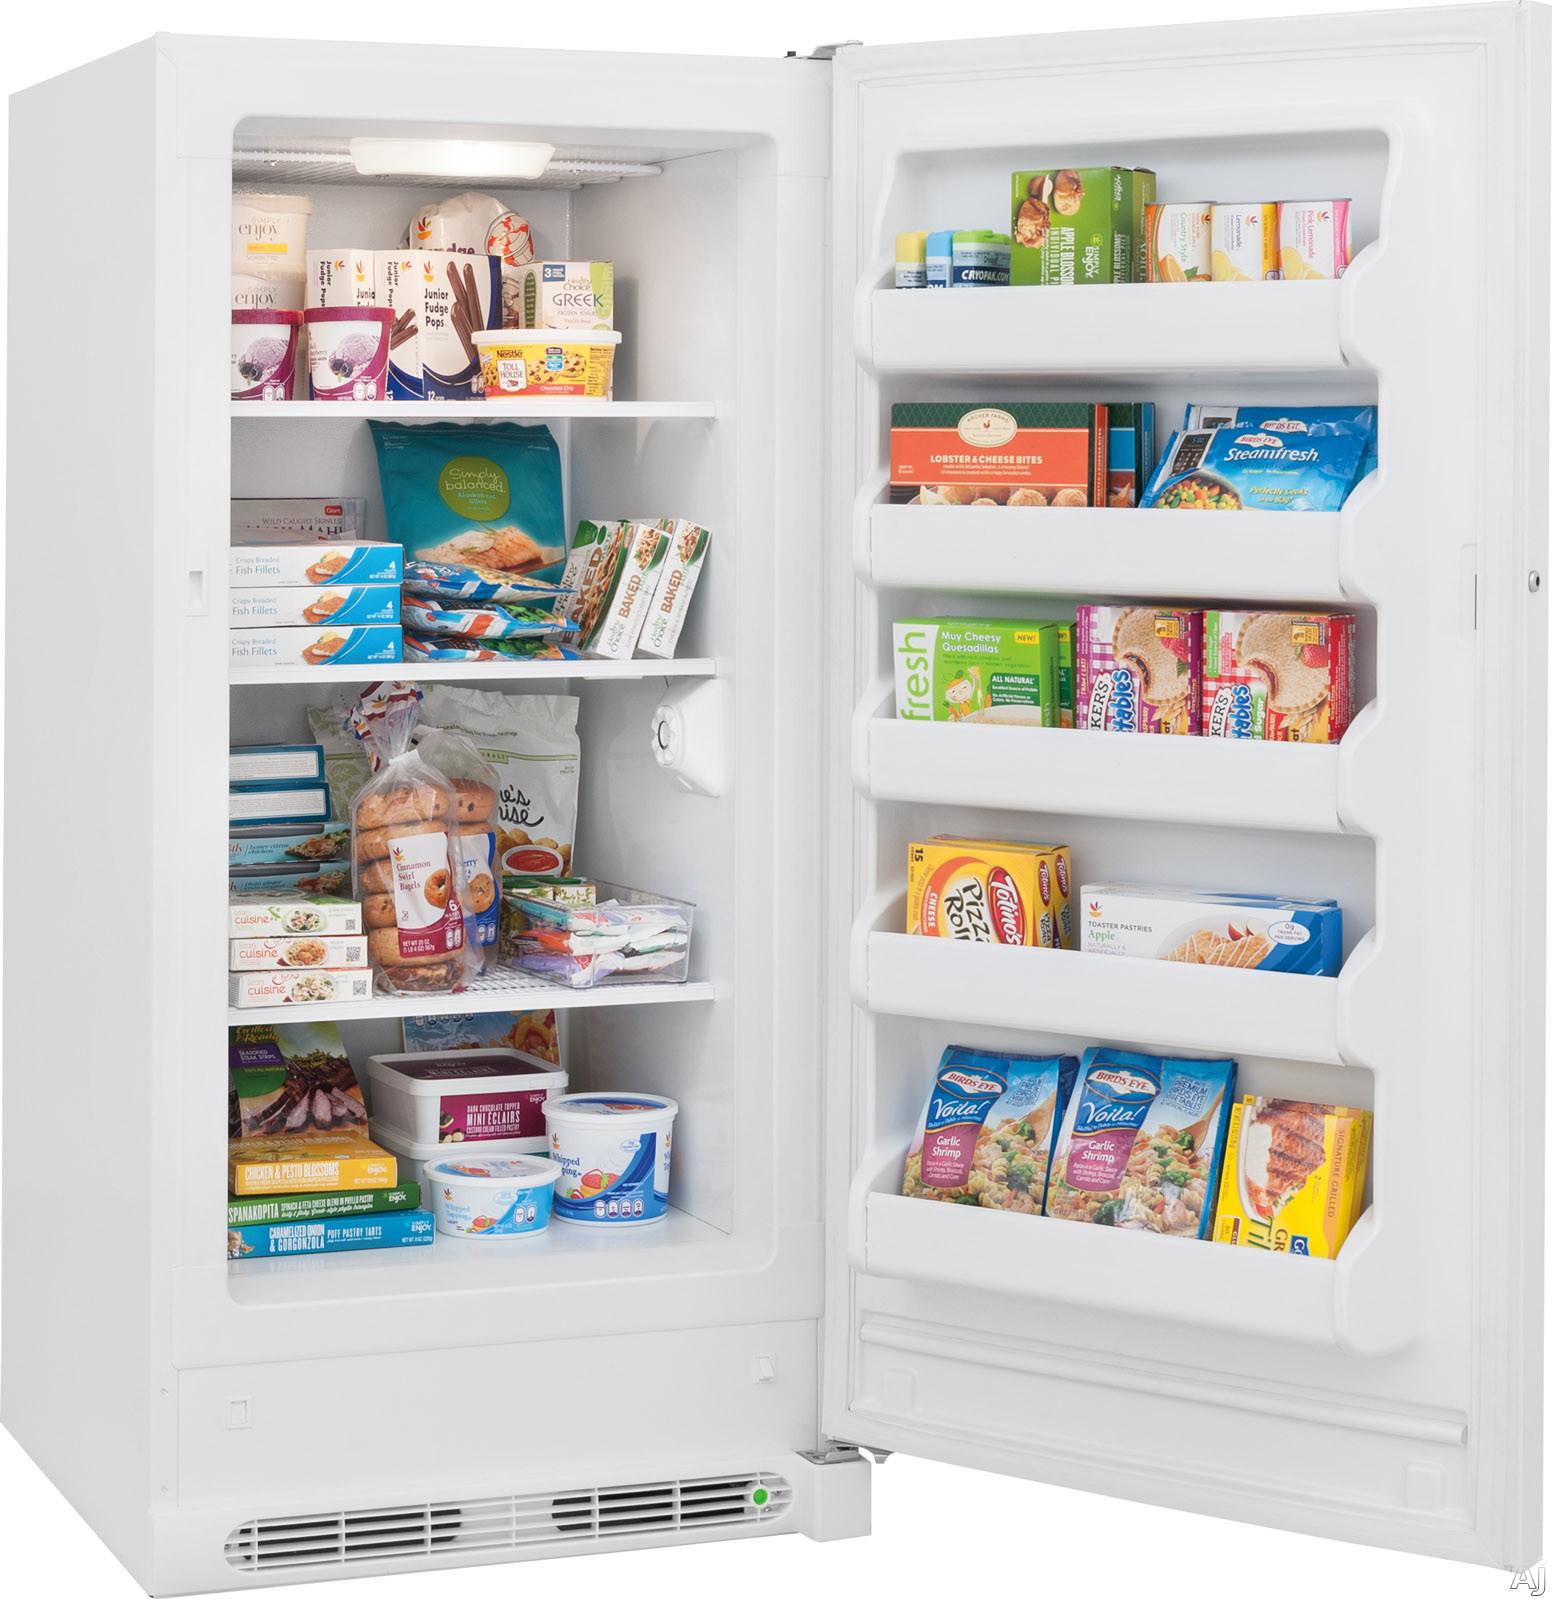 Home > Refrigeration > Freezers > Upright Freezers > FFFU14M1QW #1D7BAE